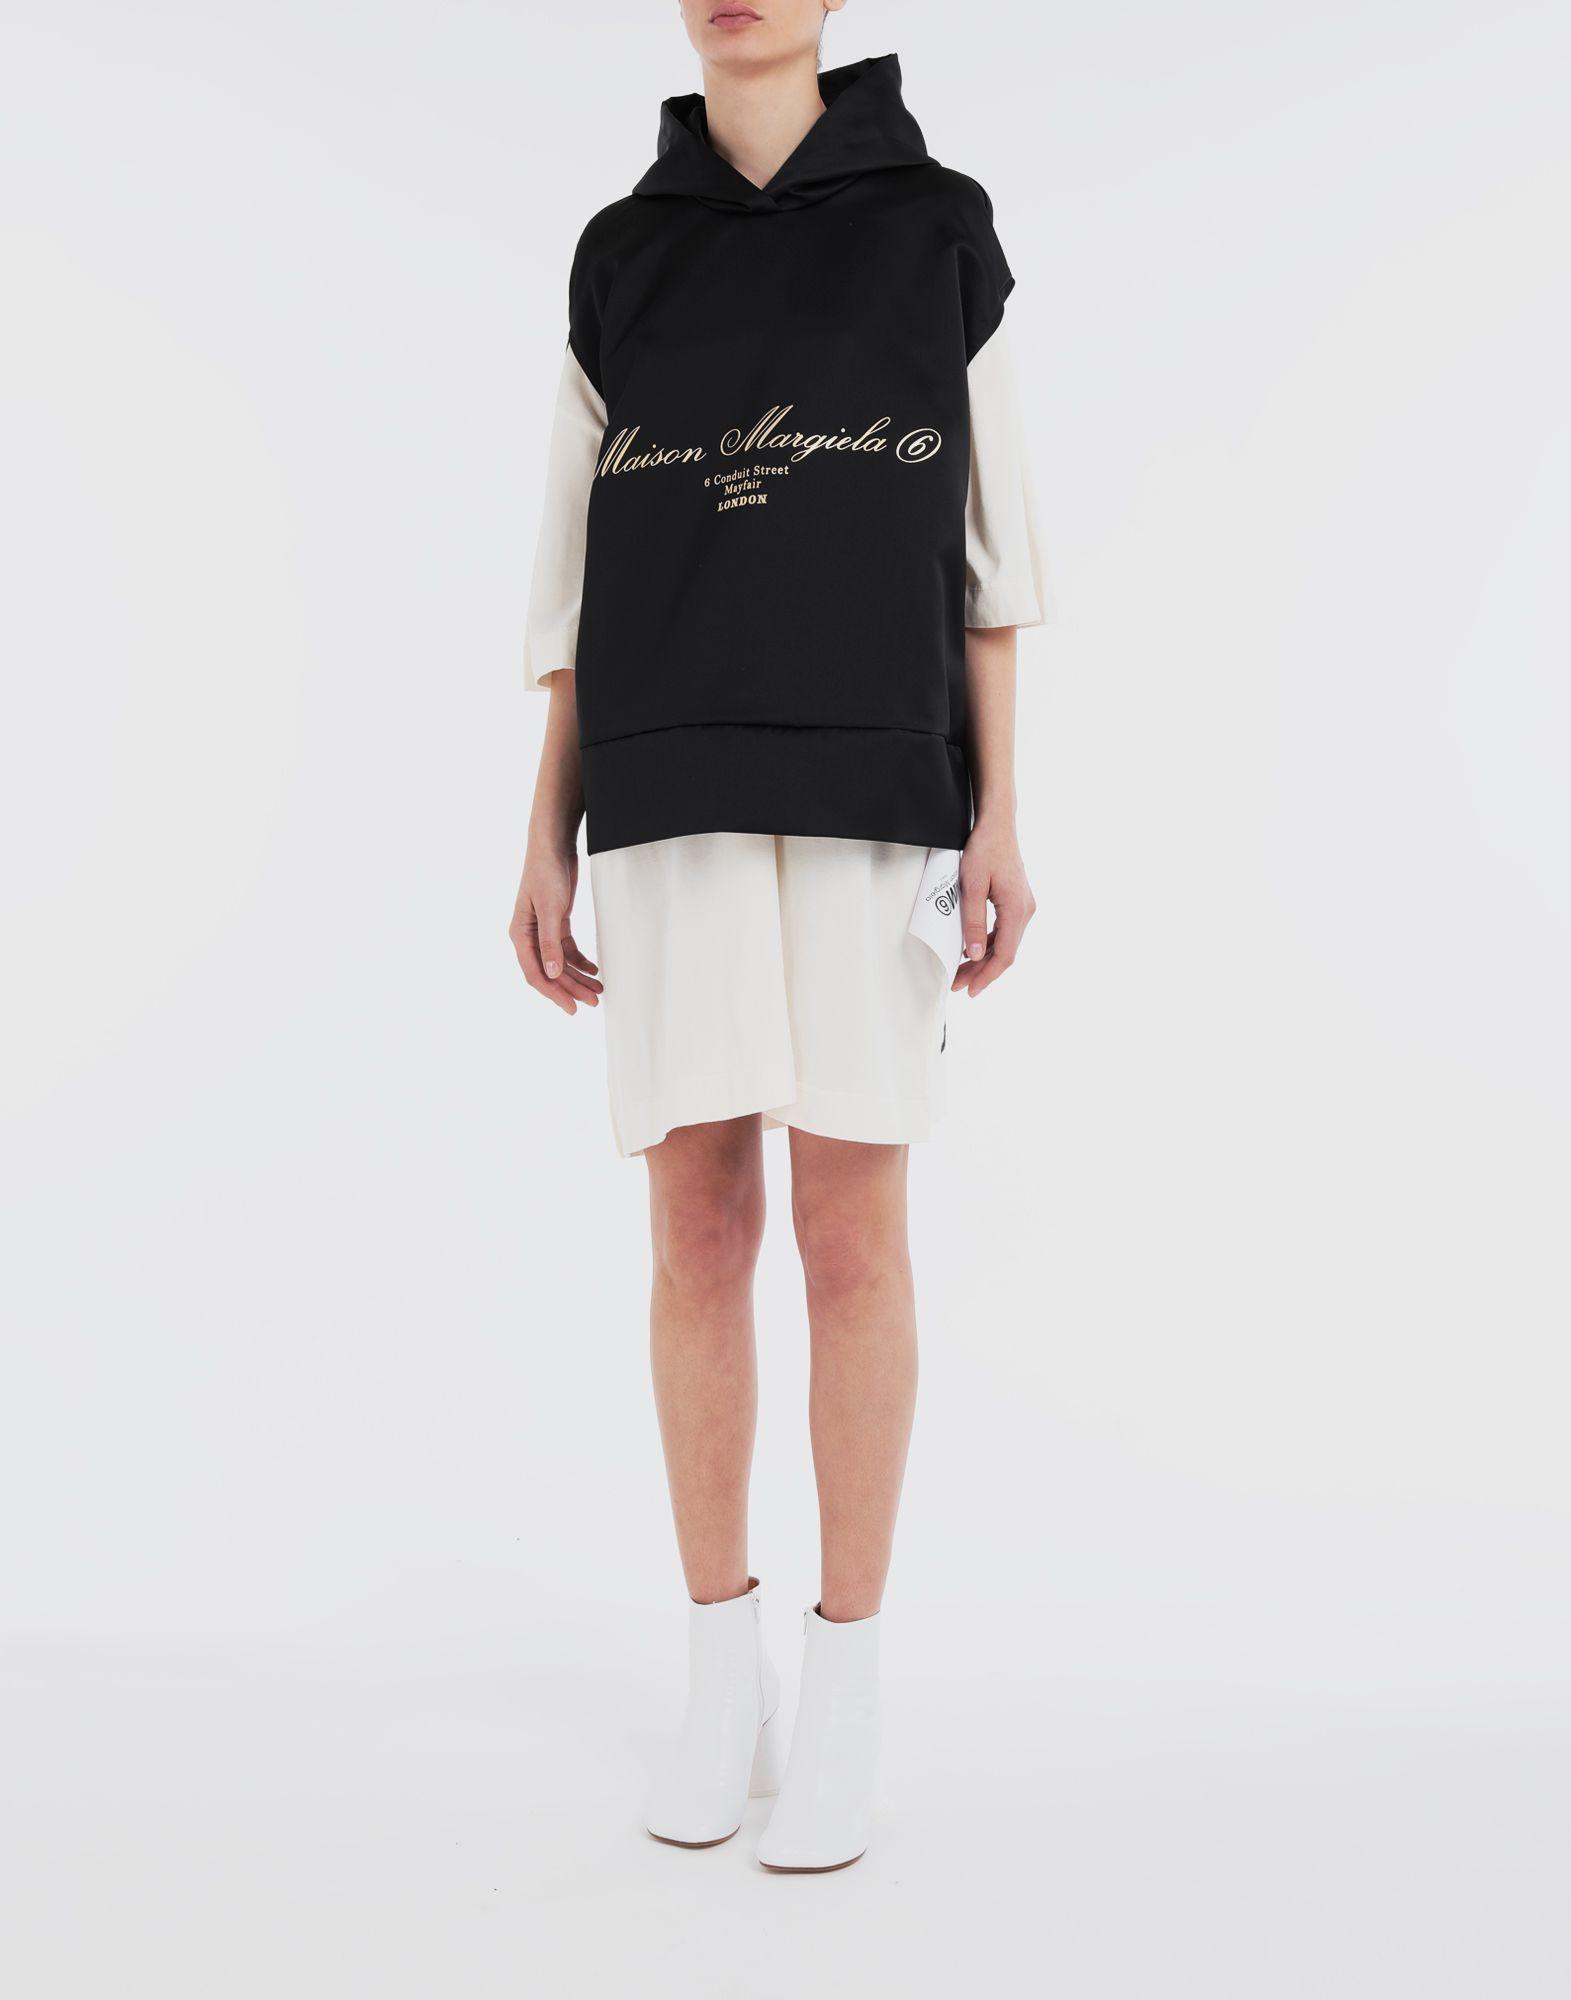 MM6 MAISON MARGIELA Charity AIDS-print dress Short dress Woman d